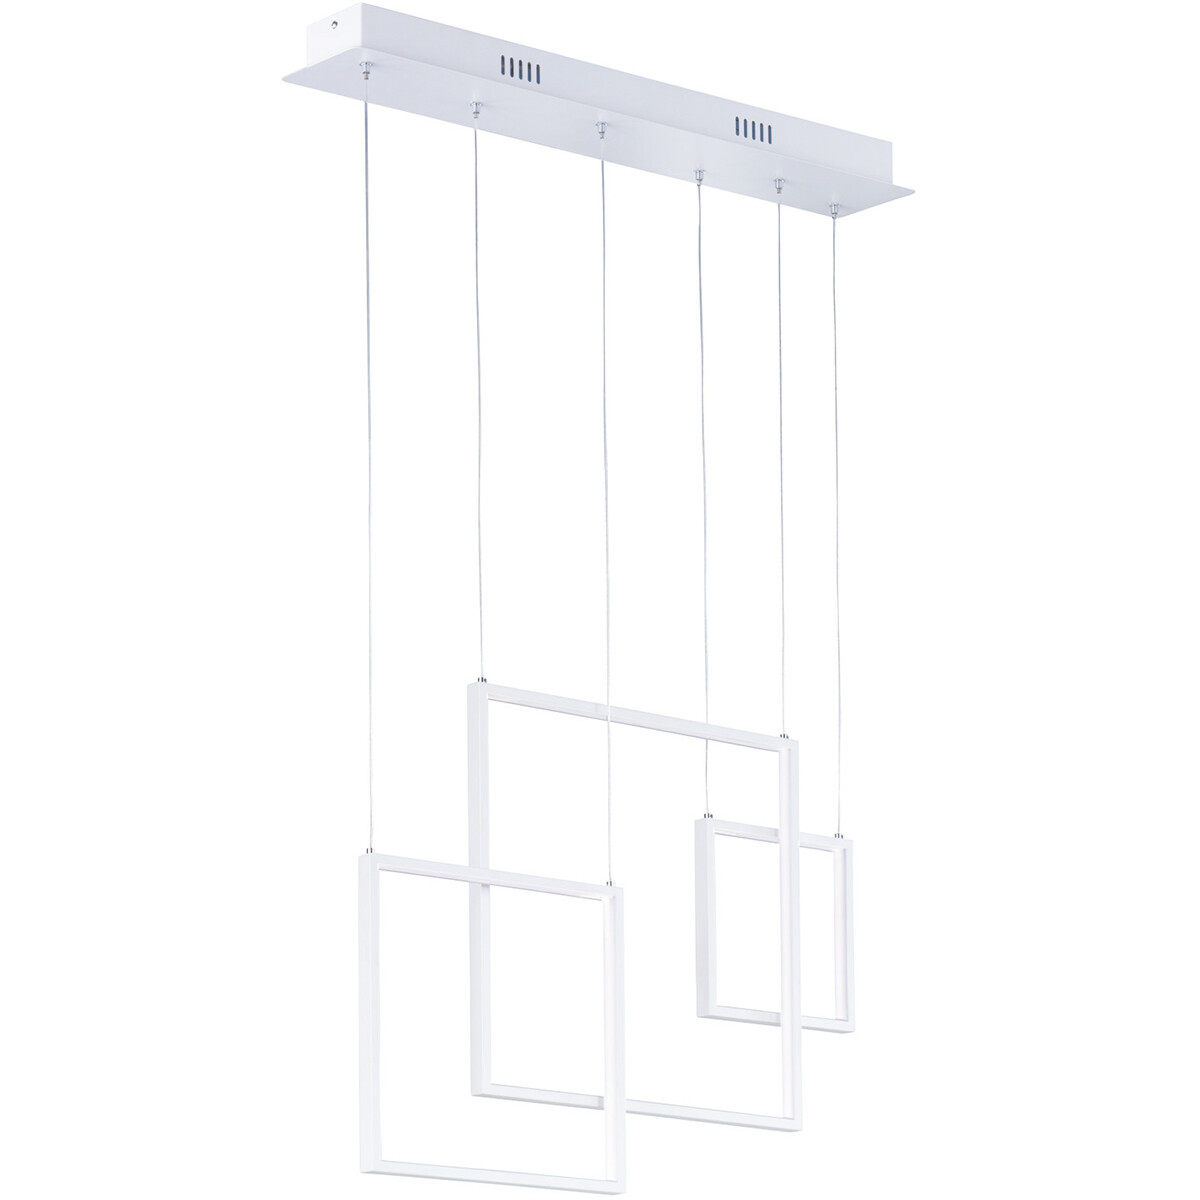 LED Hanglamp - Hangverlichting - Trion Tucino - 26W - Warm Wit 3000K - Rechthoek - Mat Wit - Alumini